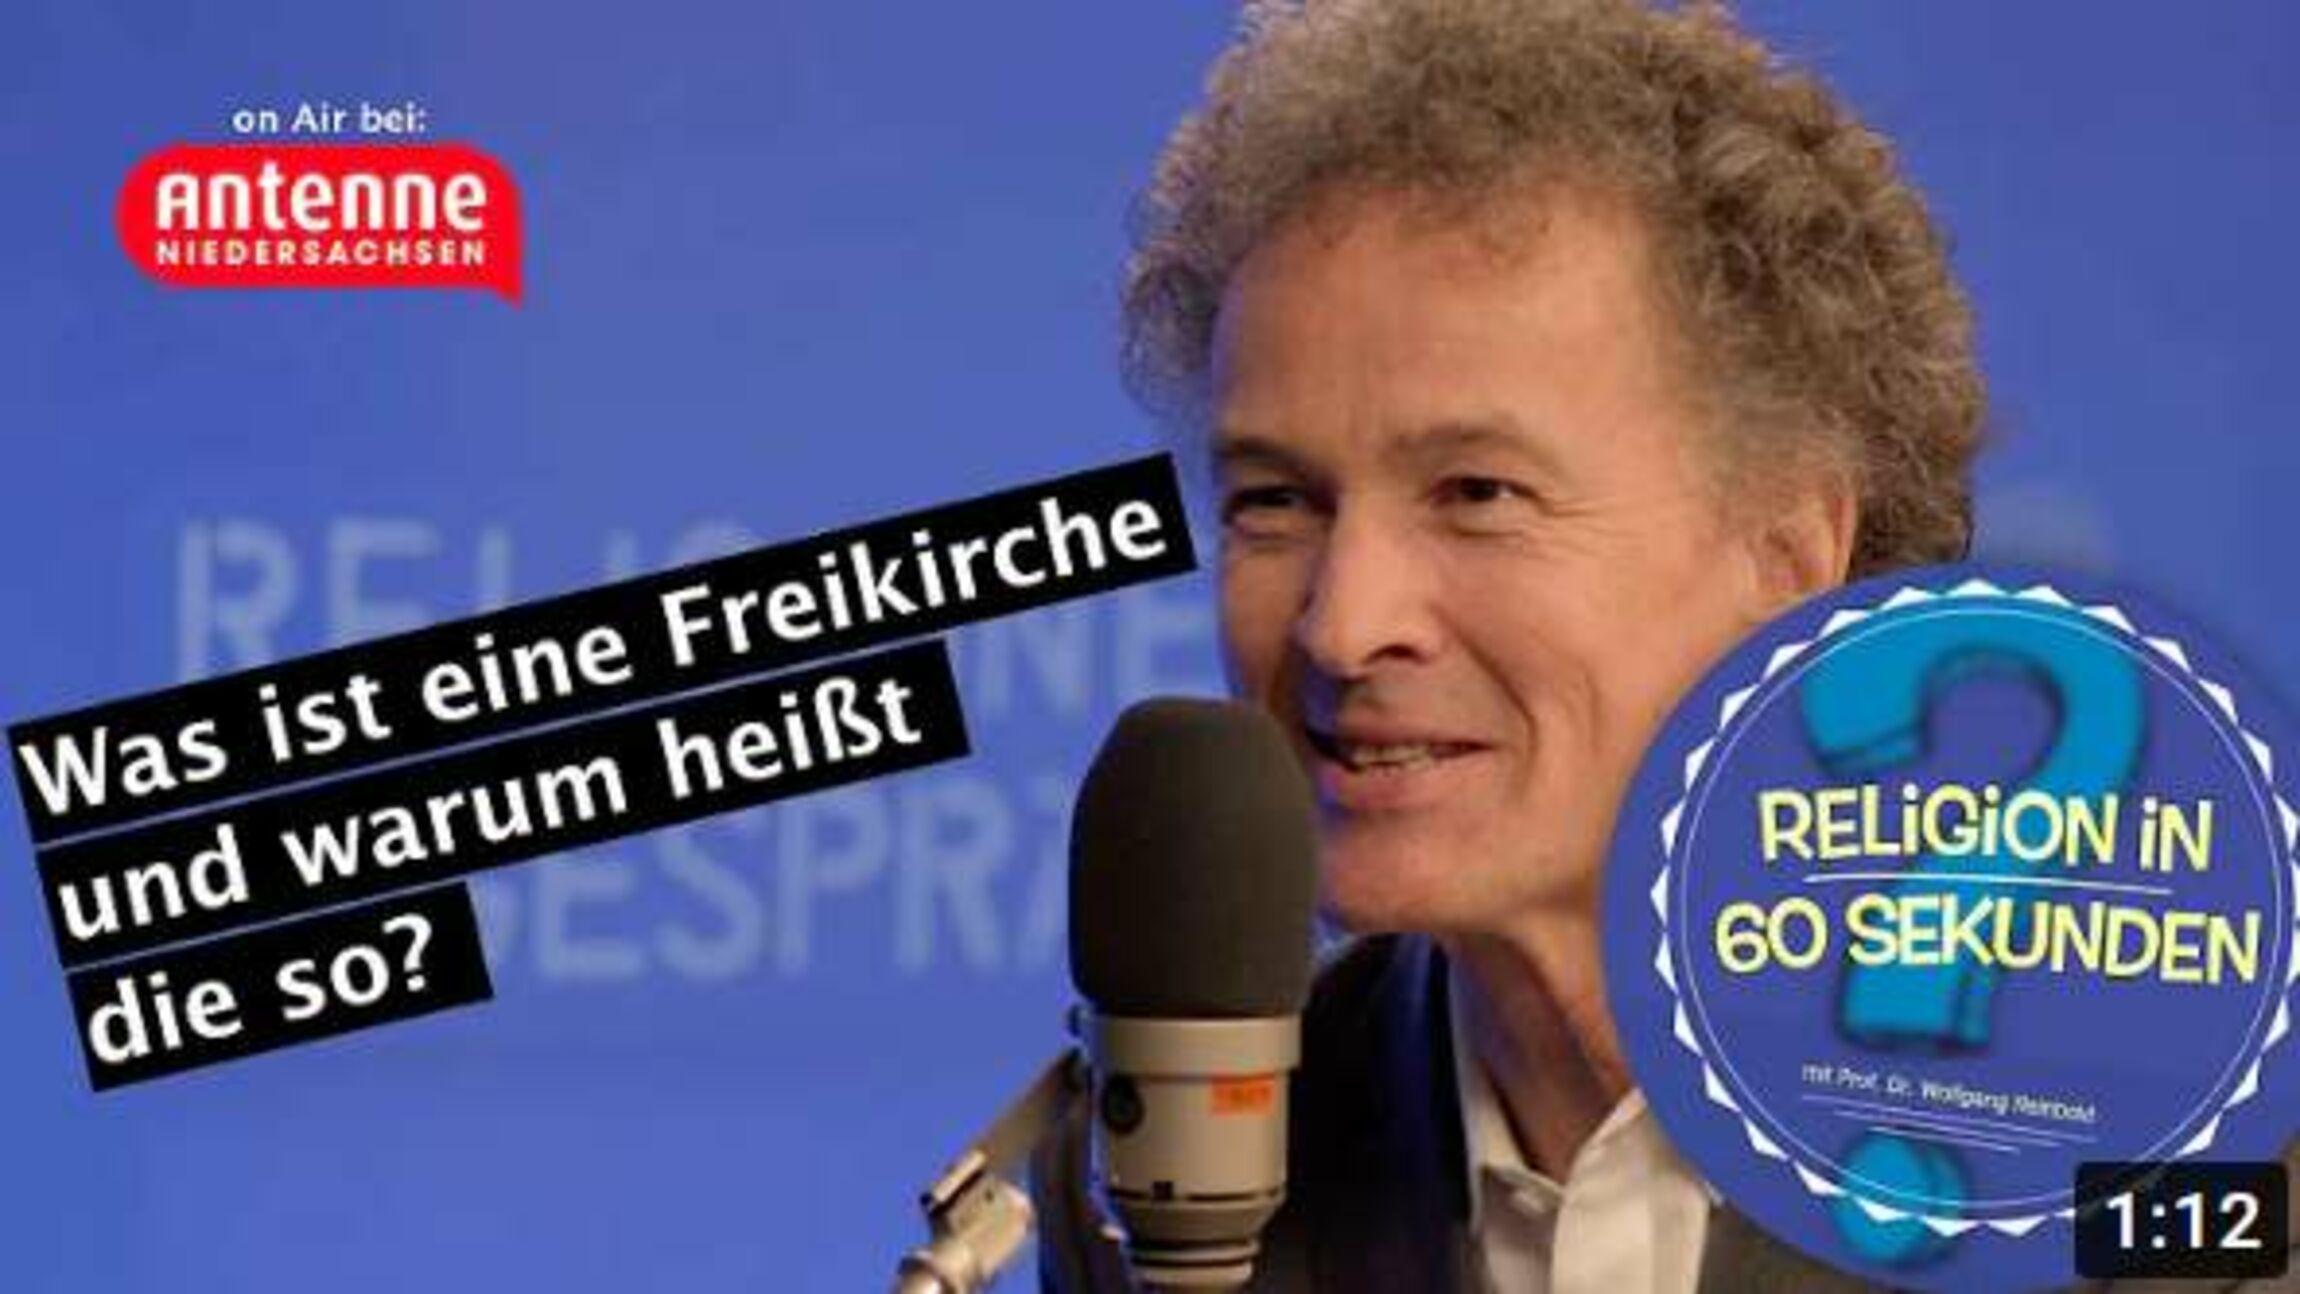 21-05-14-Religion in 60 Sekunden_Freikirche